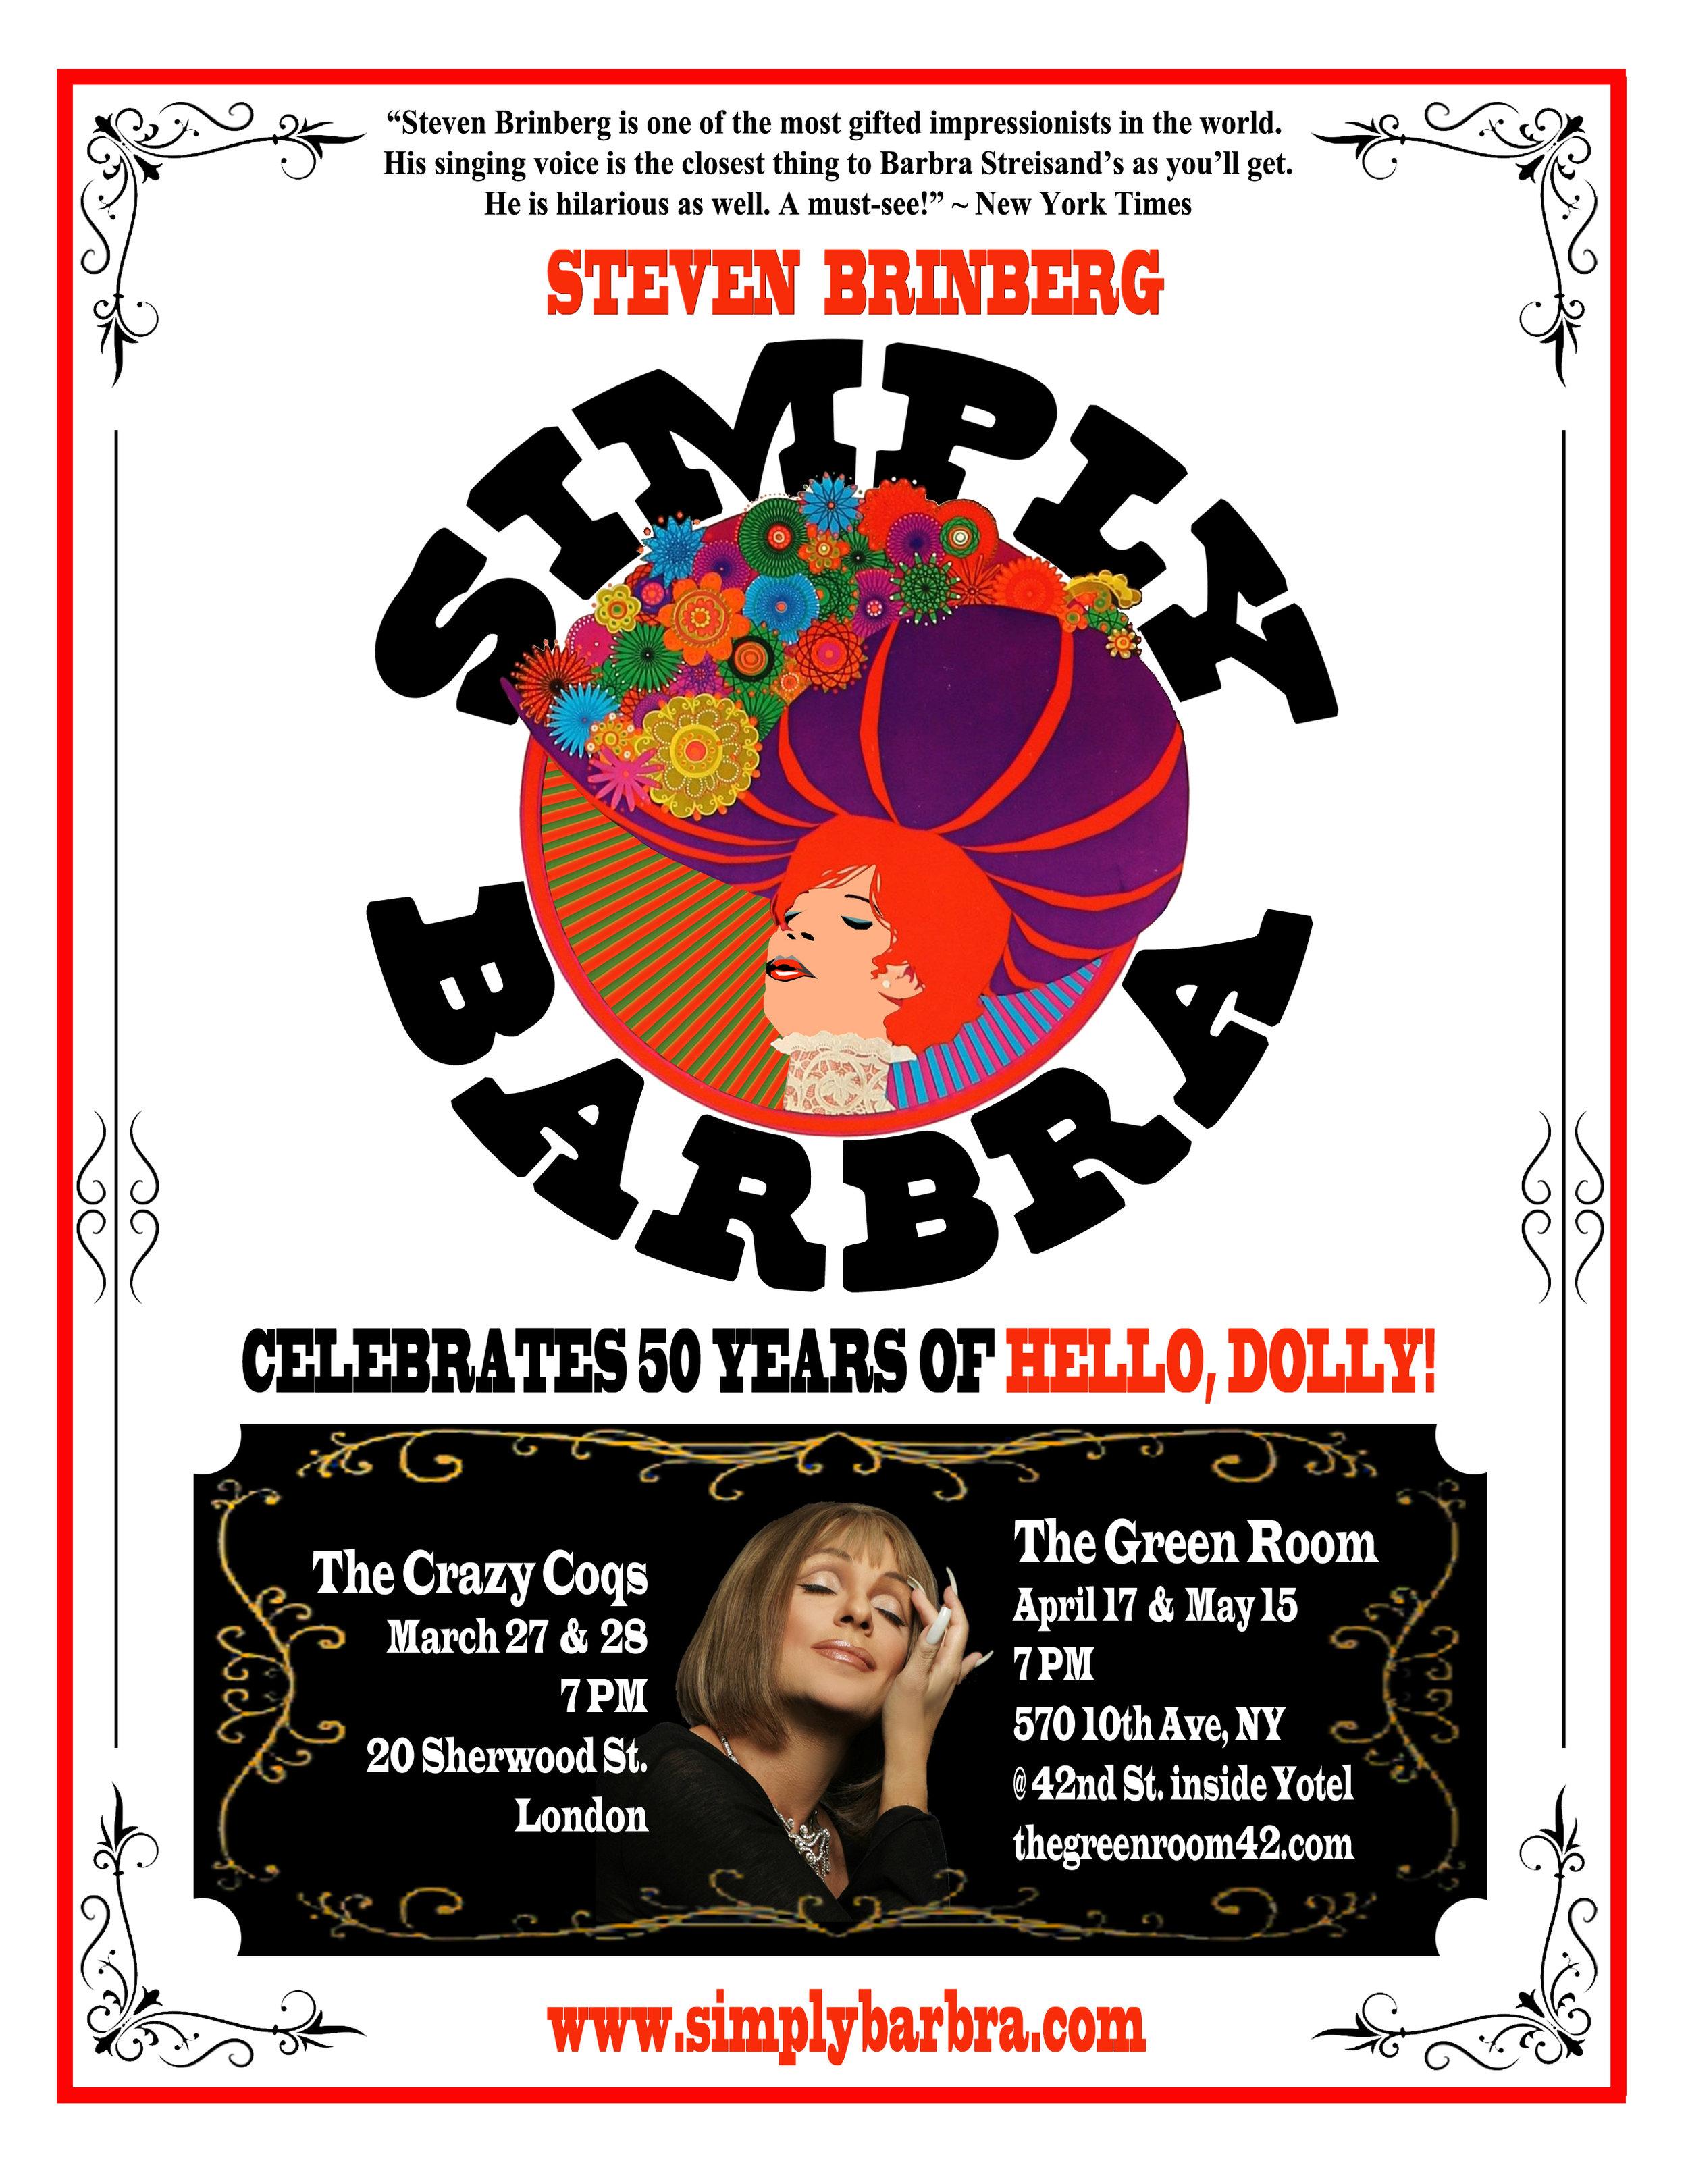 Simply Barbra Celebrates 50 Years of Hello Dolly.jpg